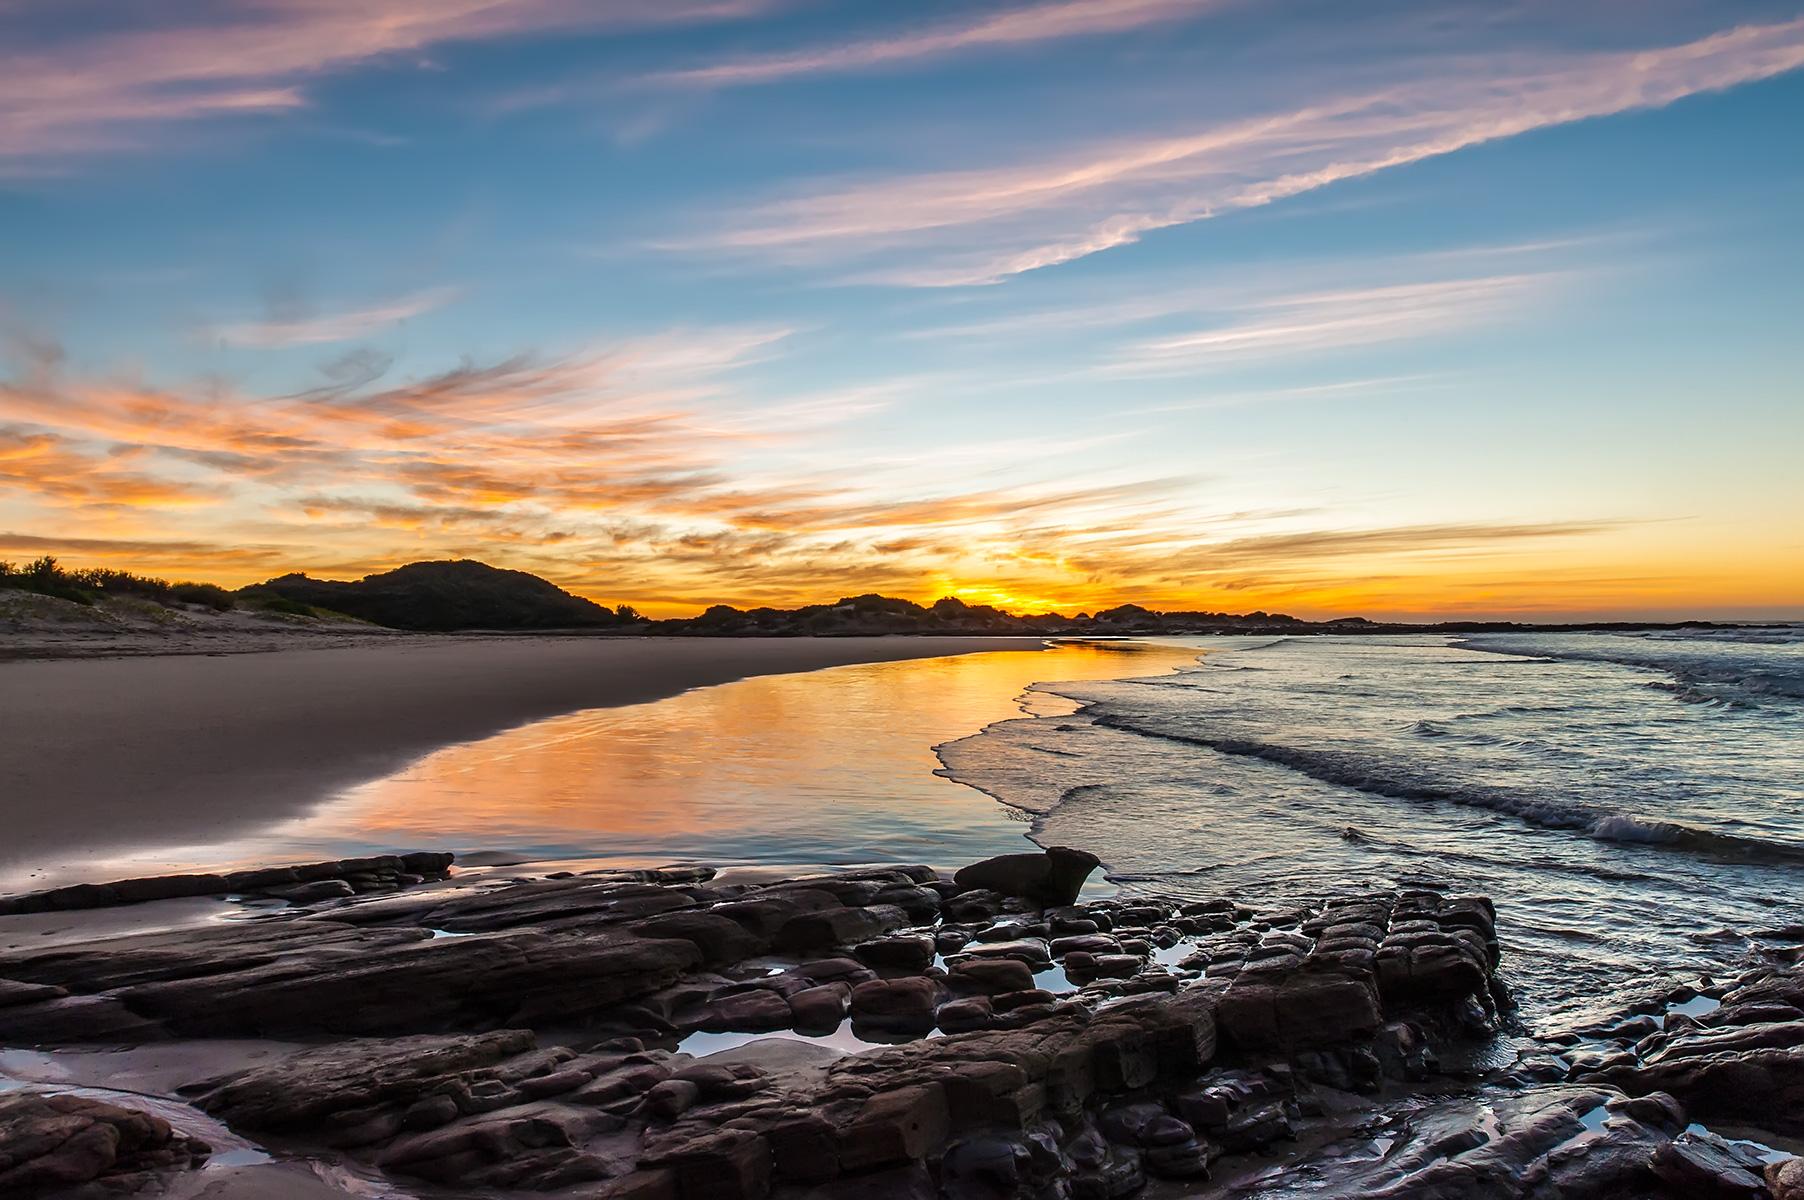 Sunset over Balugha Beach